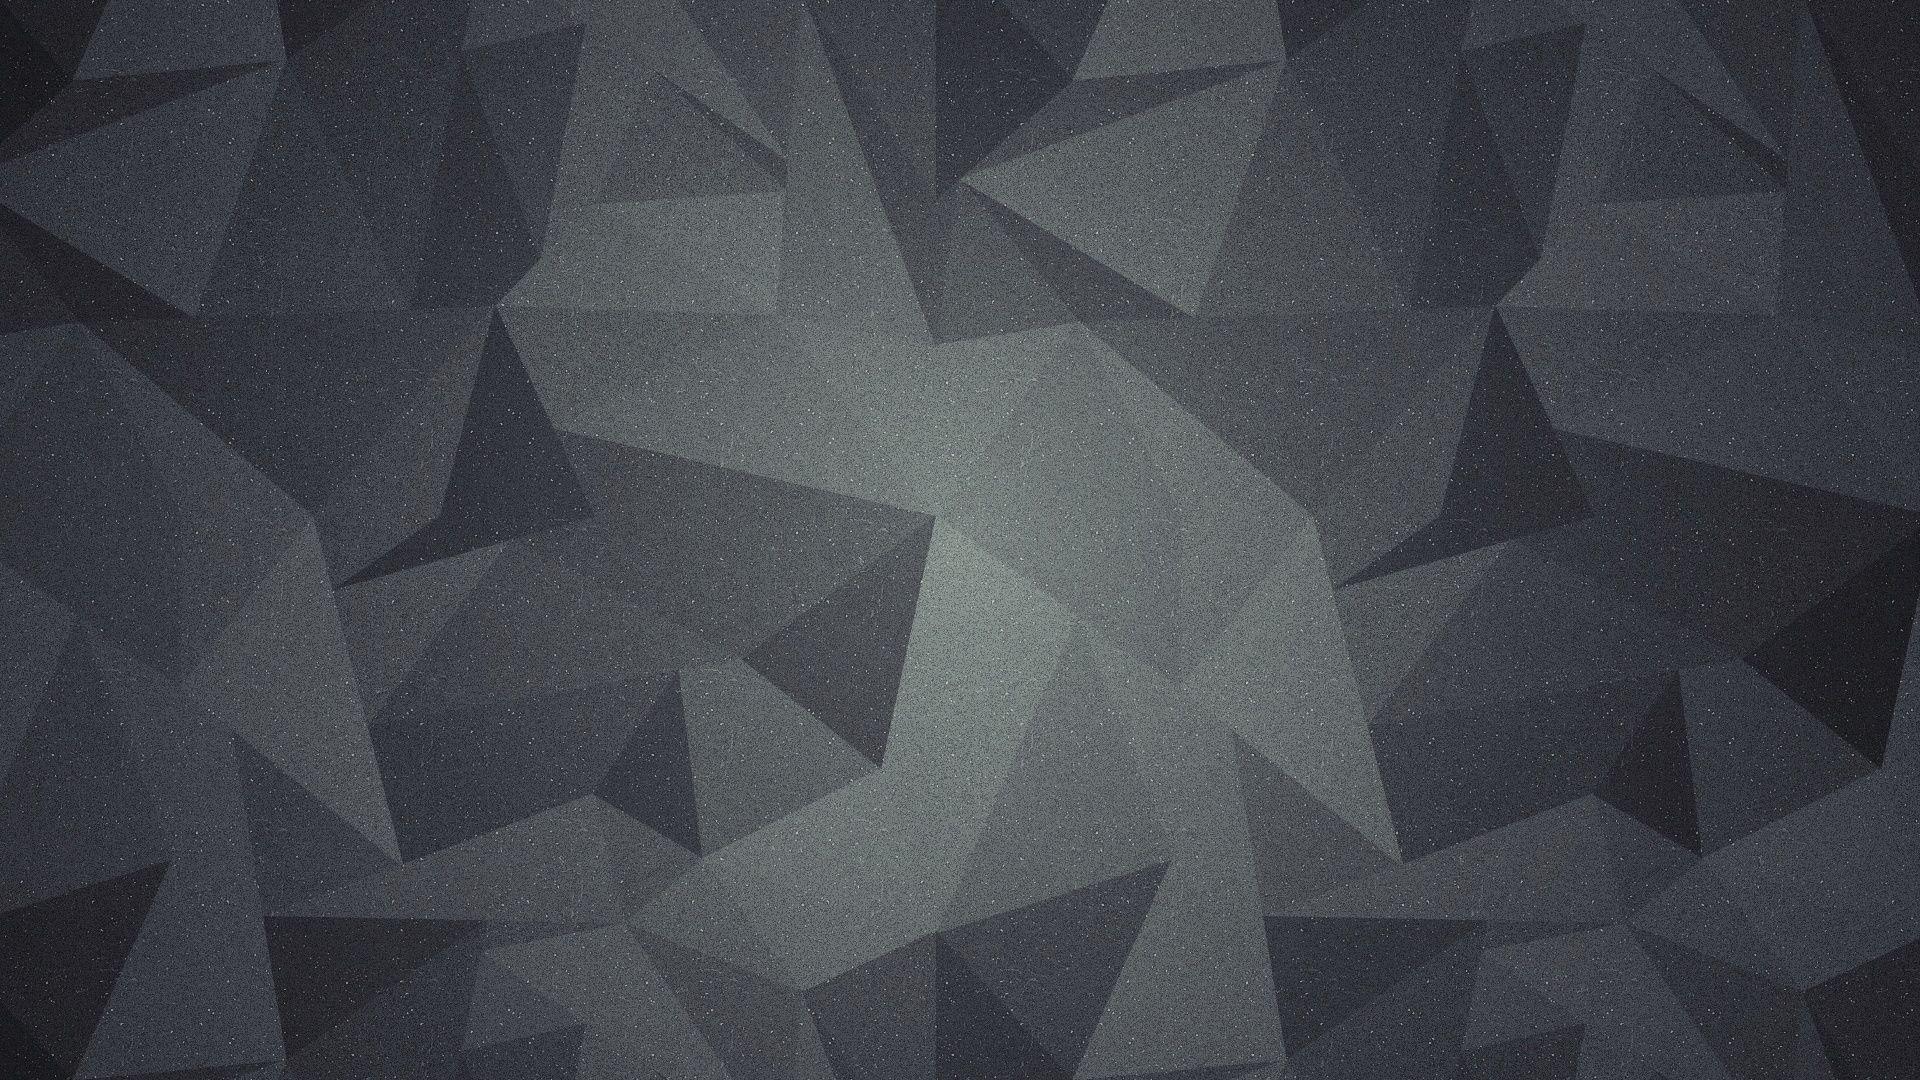 High Resolution Geometric 1080p Wallpaper - SiWallpaperHD 12893